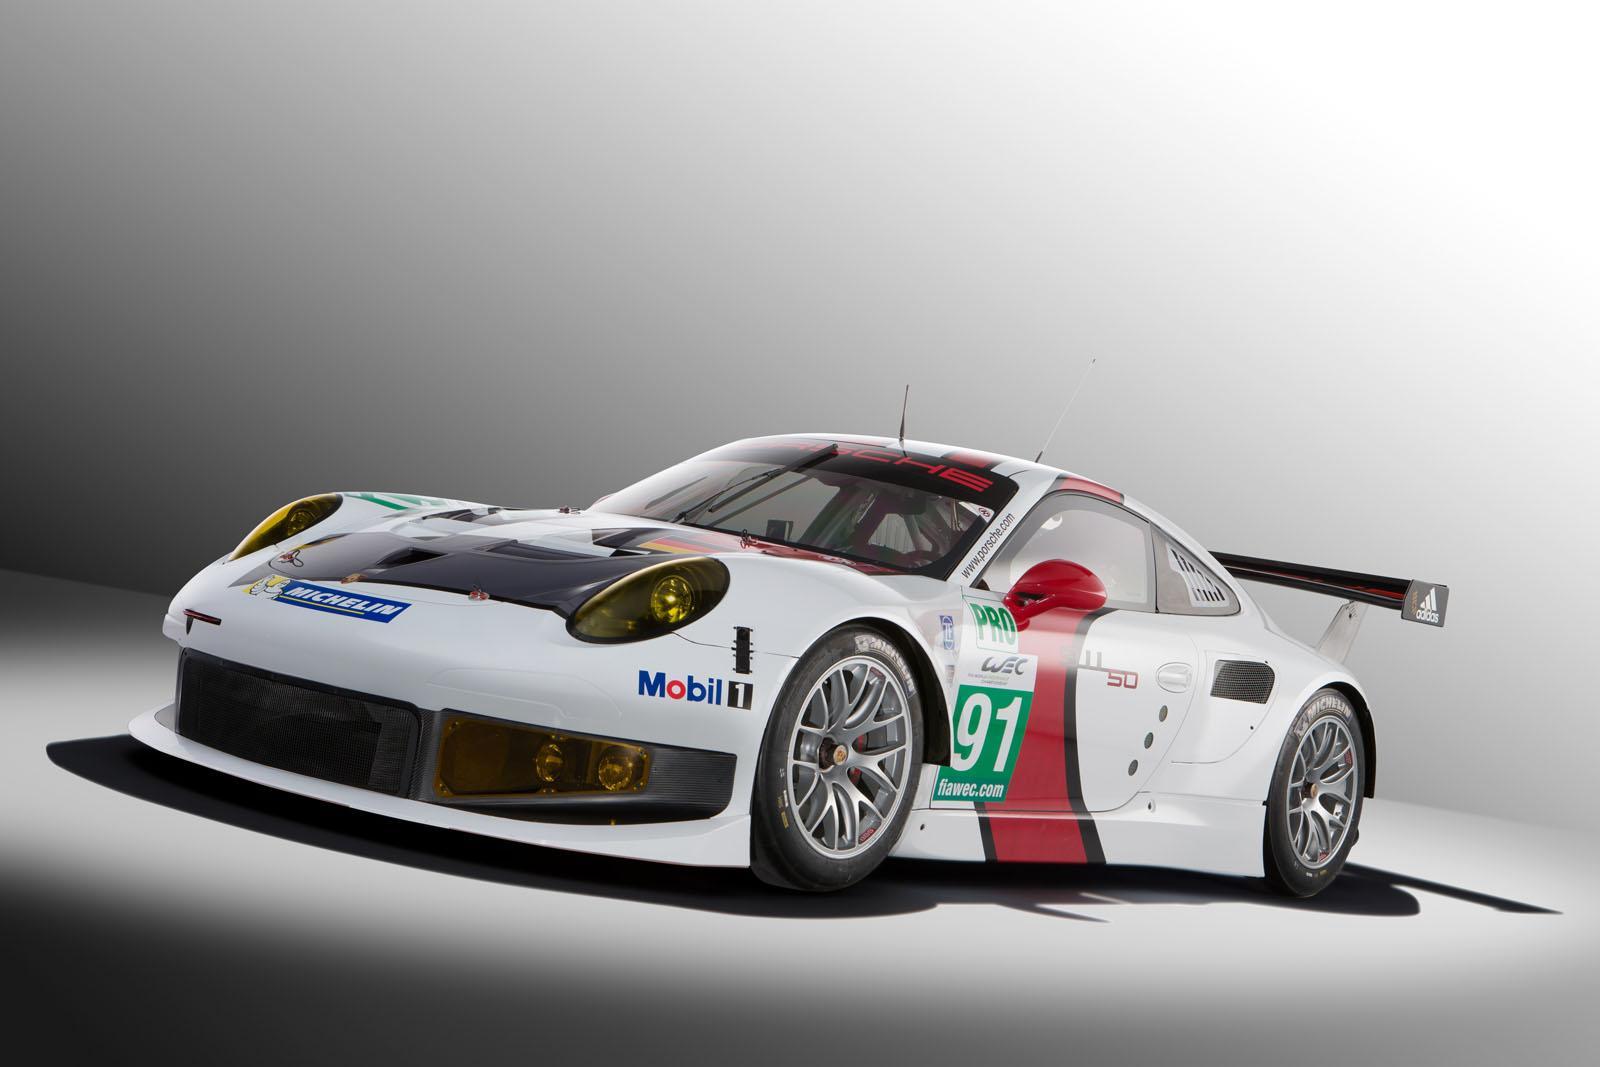 Porsche 911 rsr dise o ligero para ser el m s resistente for Porche diseno